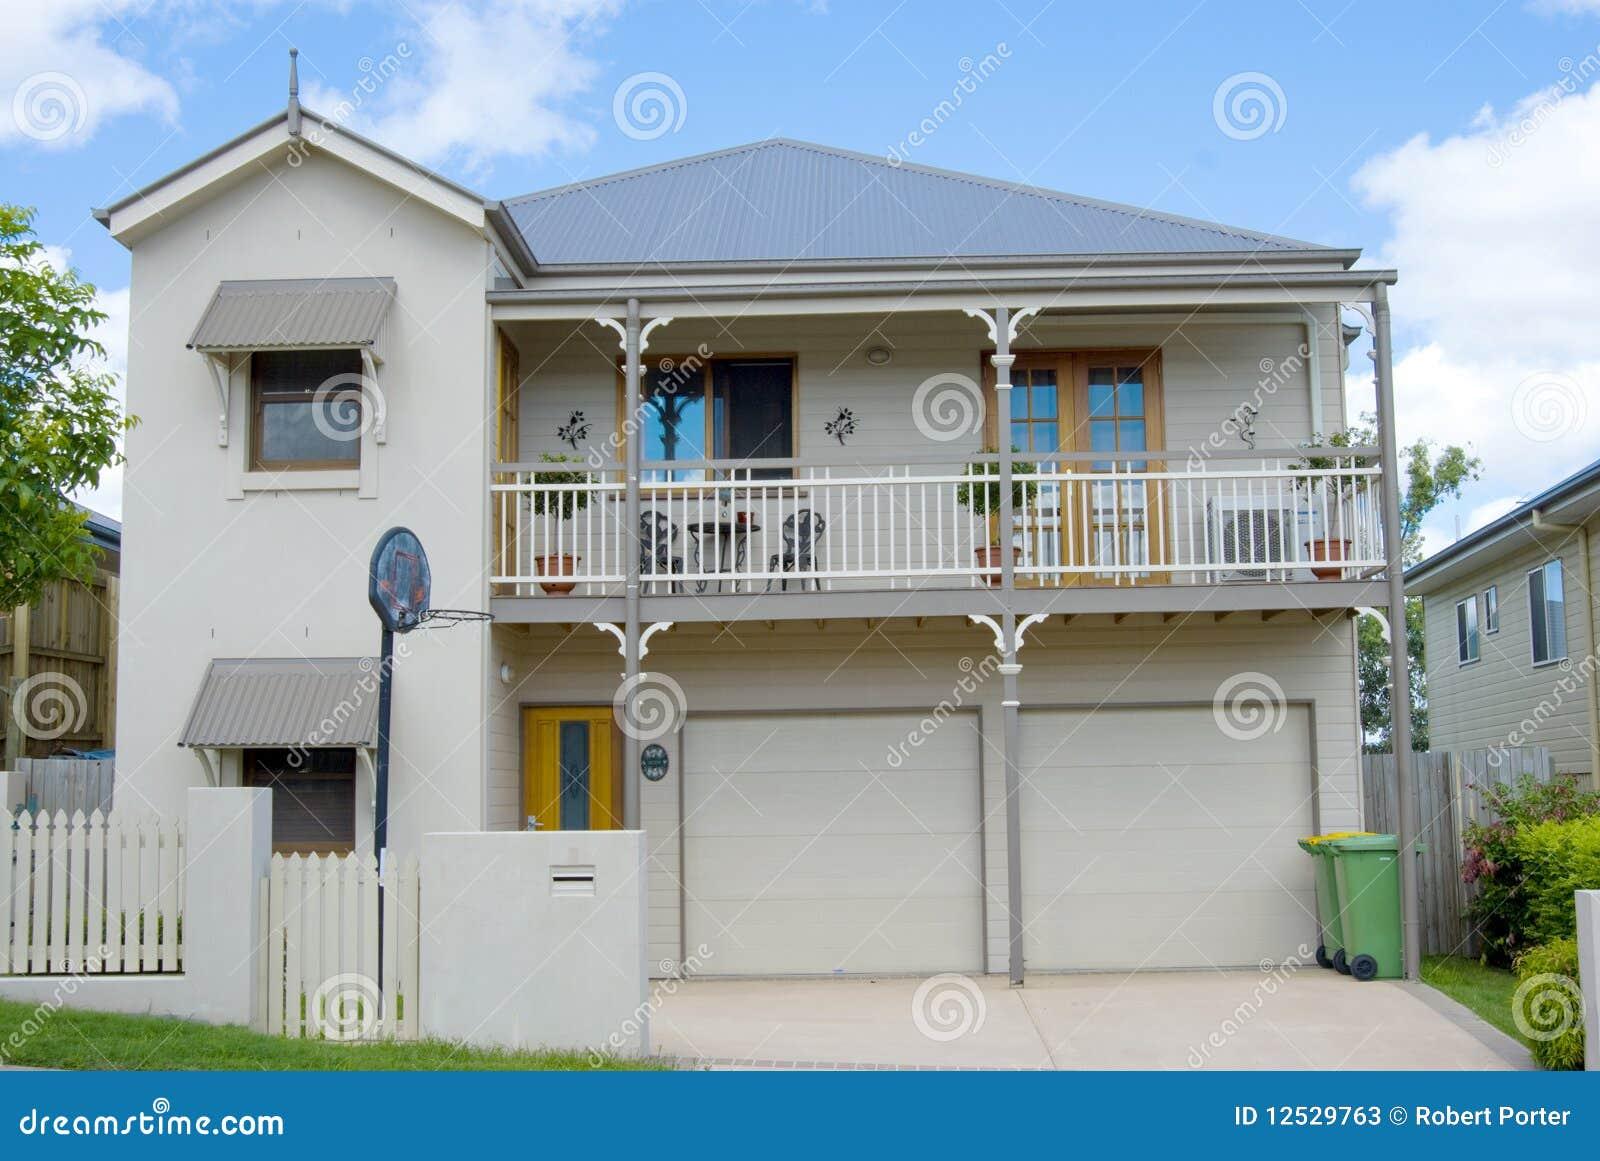 Casa colonial moderna fotos de archivo imagen 12529763 - Imagen de casas ...